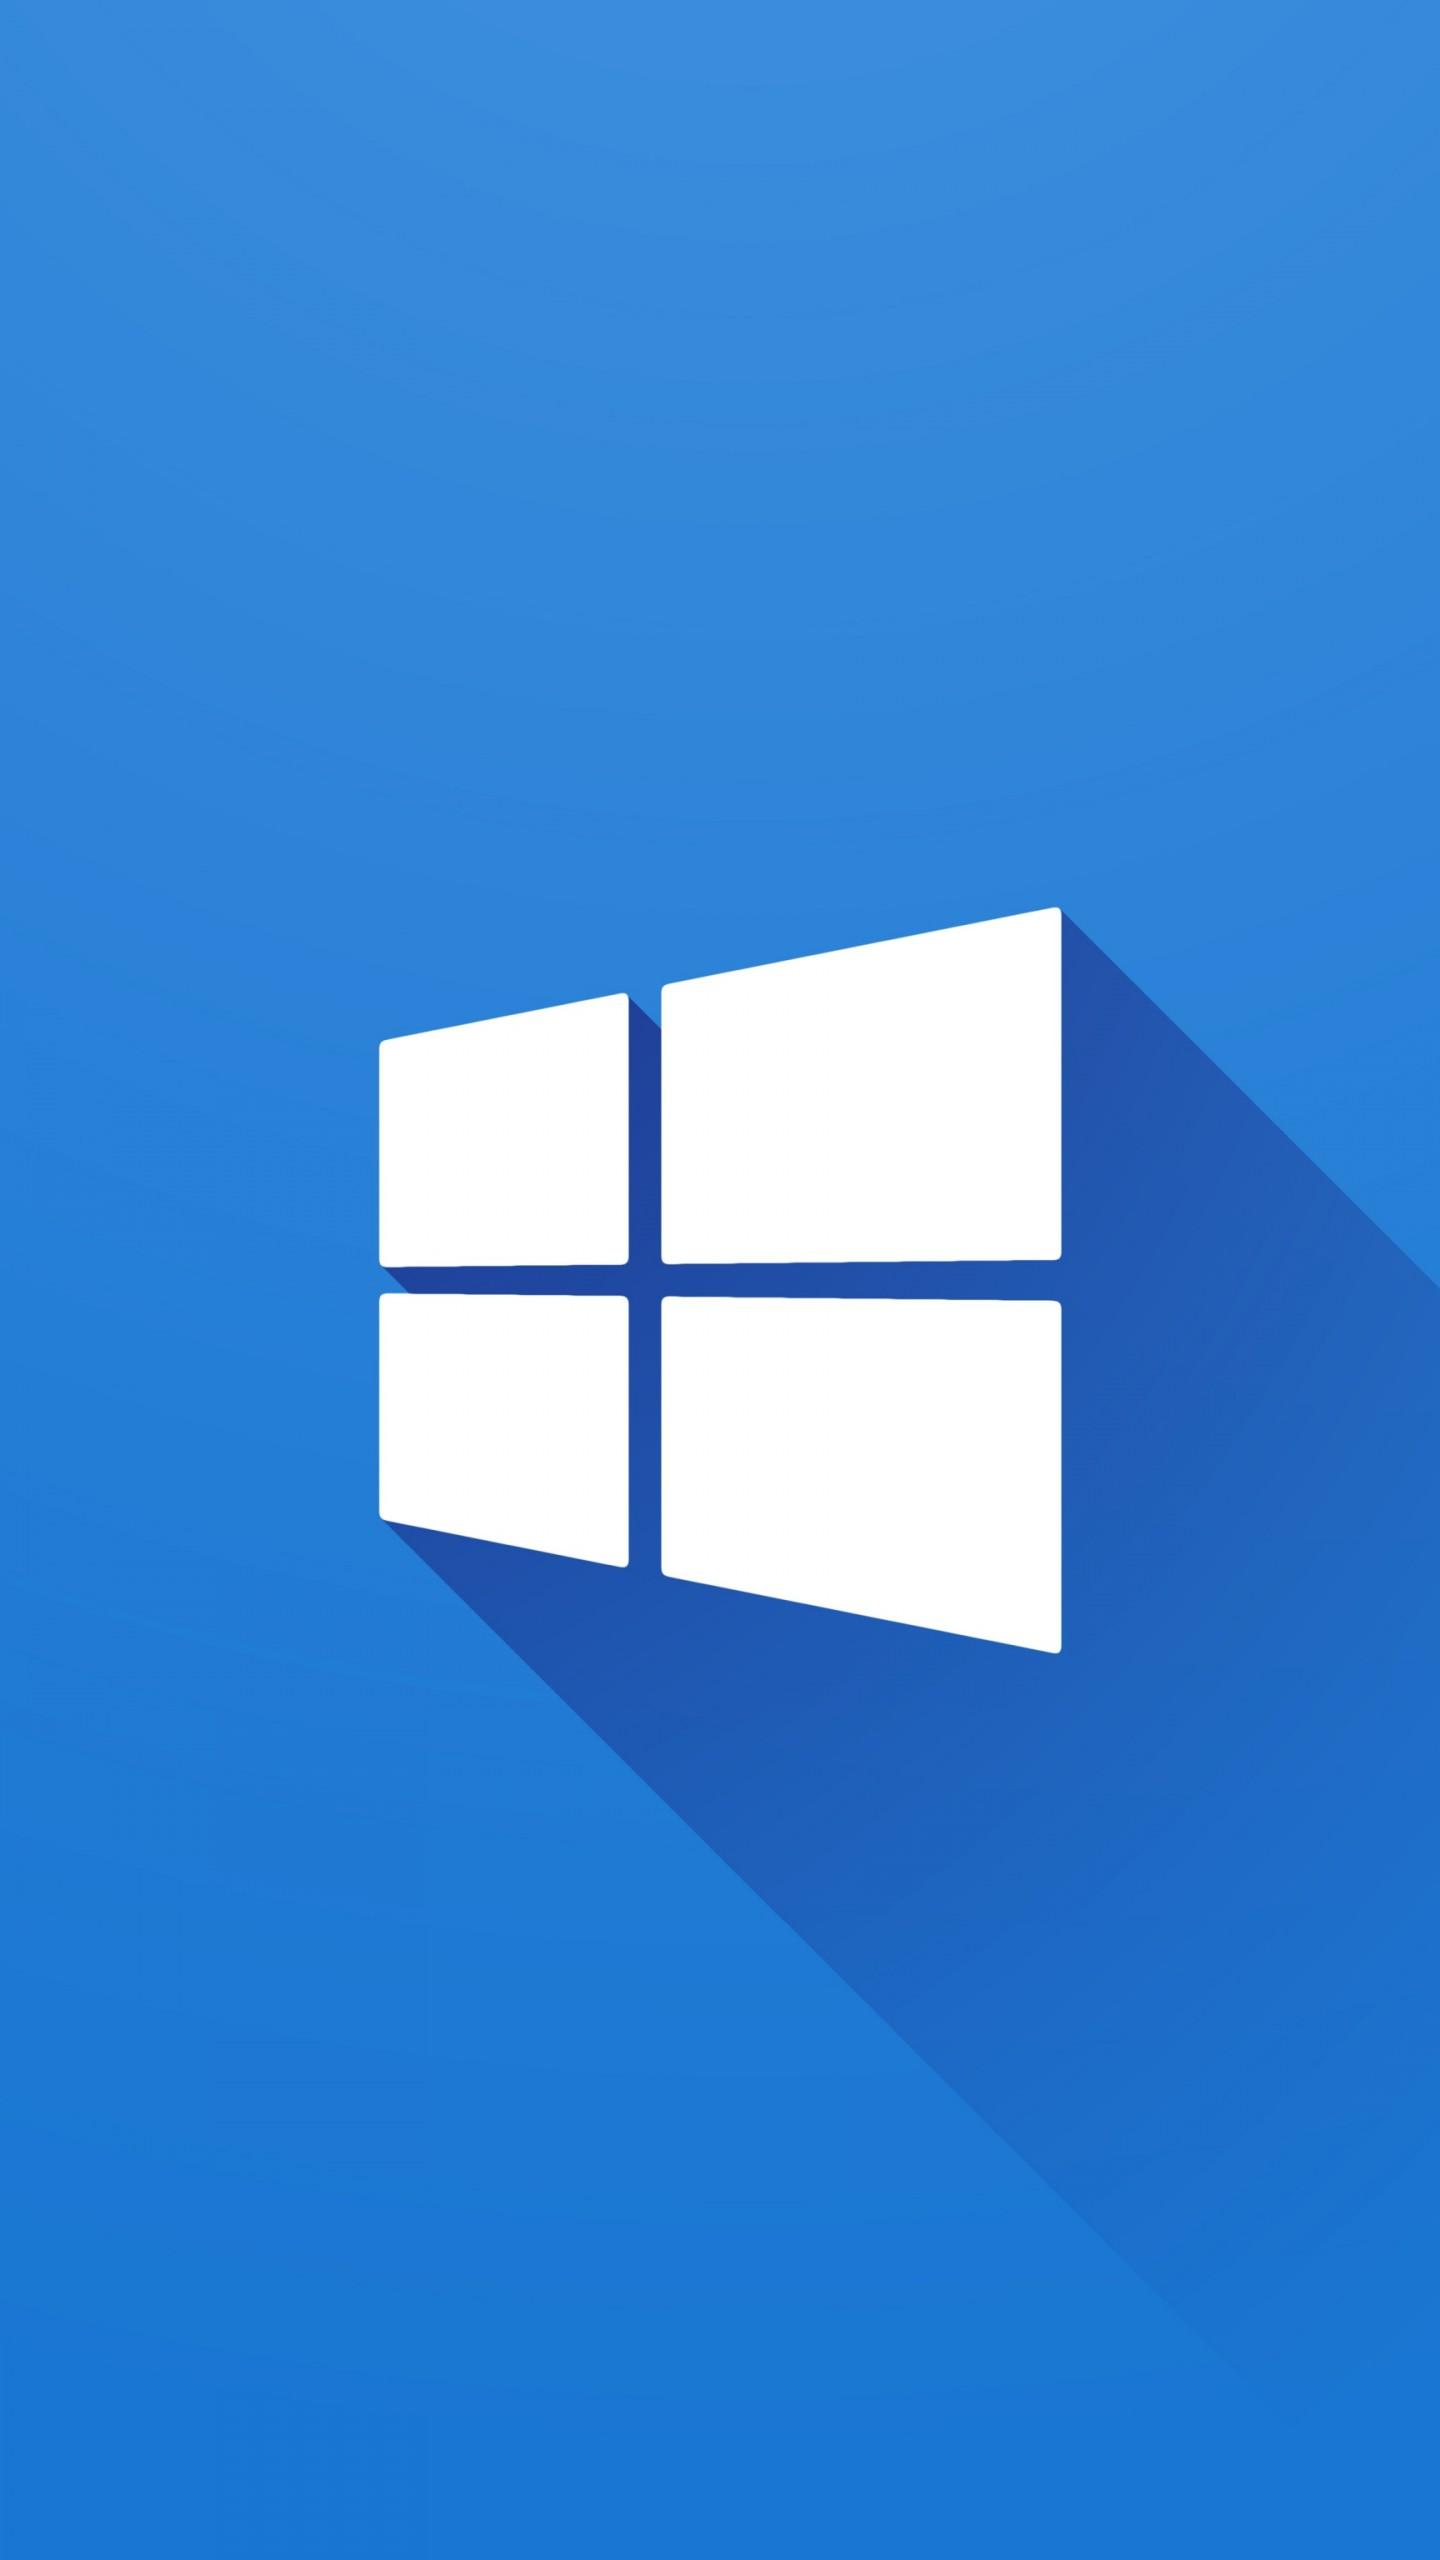 Wallpaper Windows 10 4k 5k Wallpaper Microsoft Blue Os 6991